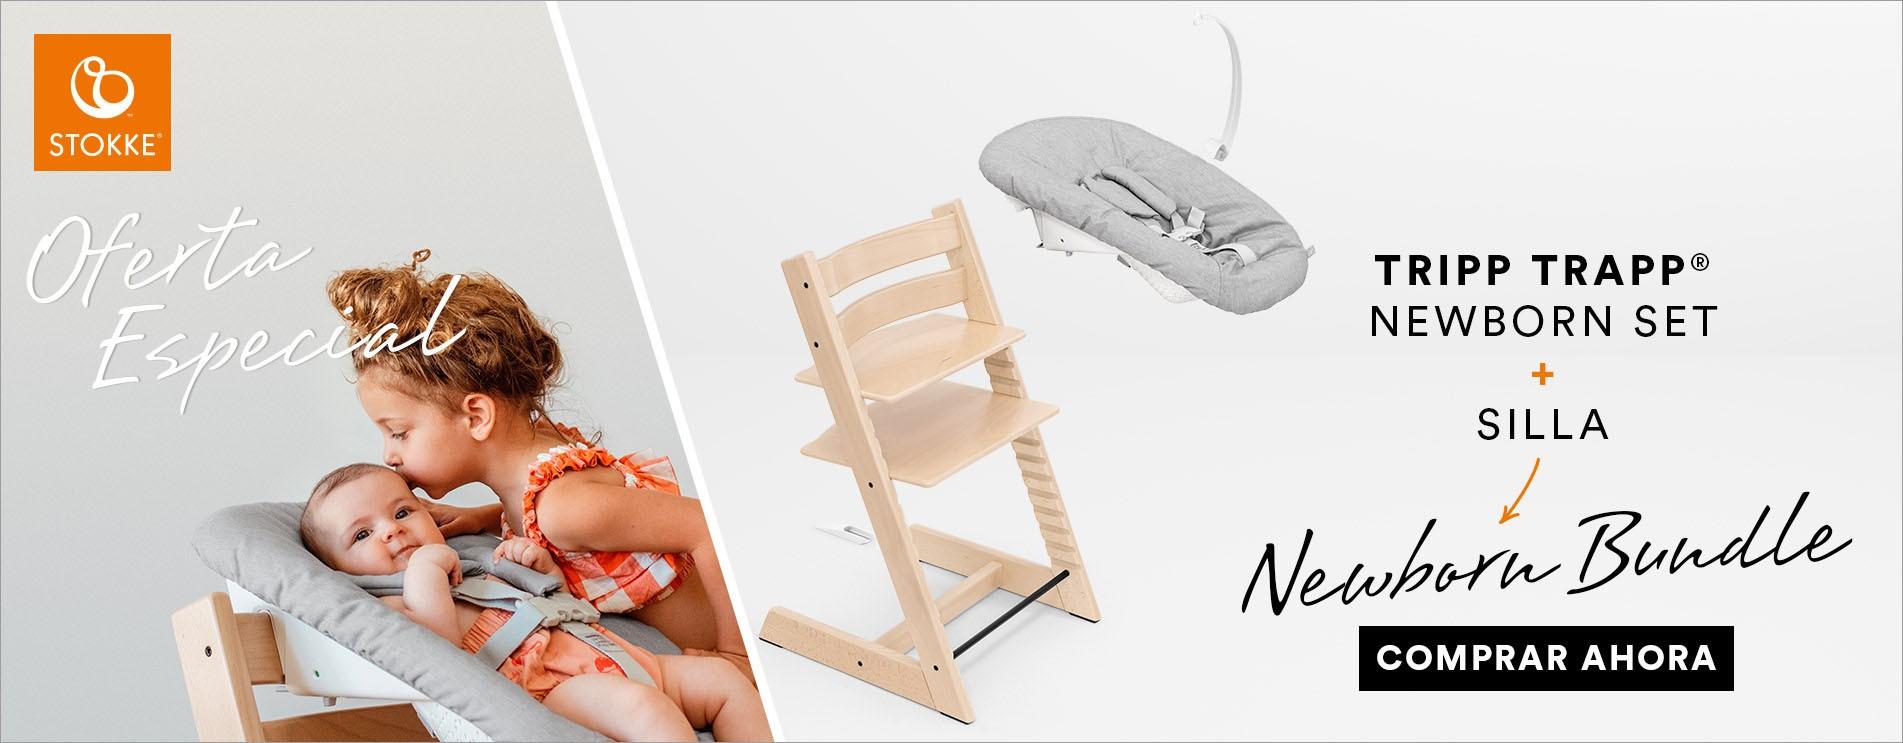 Bundle Stokke Tripp Trapp+Newborn set